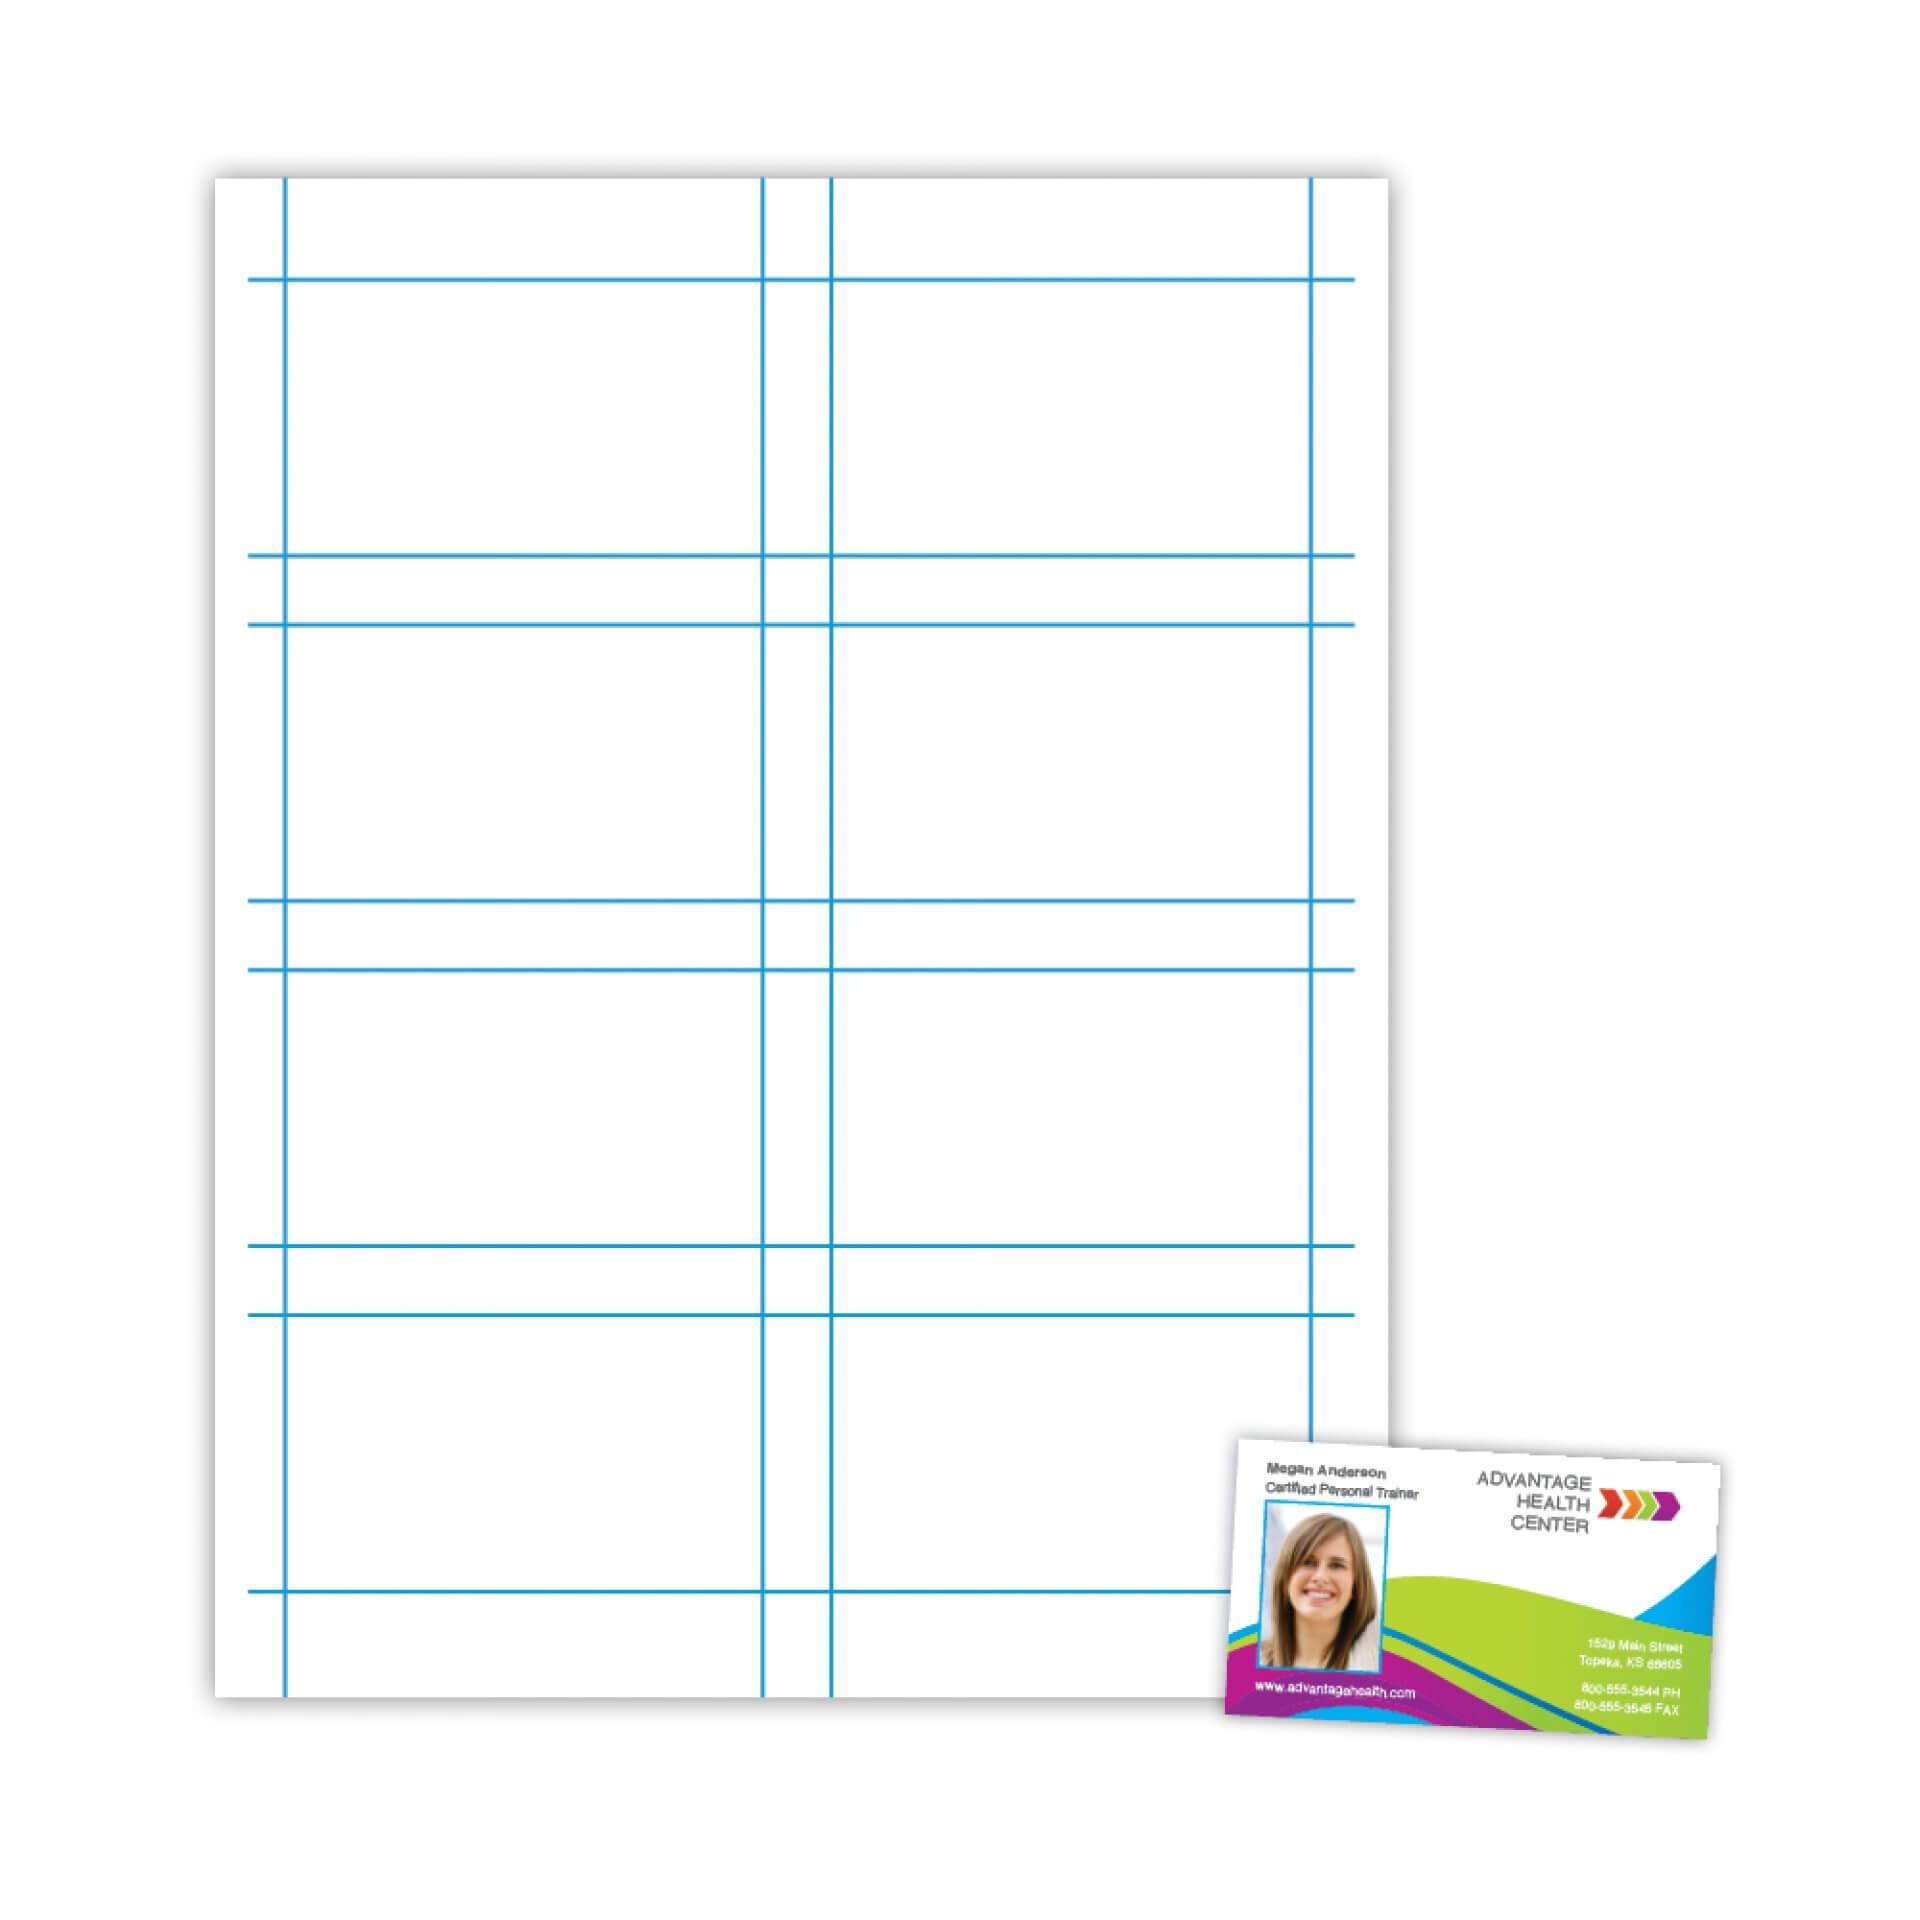 025 Plain Business Card Template Blank Microsoft Word Free Intended For Plain Business Card Template Microsoft Word